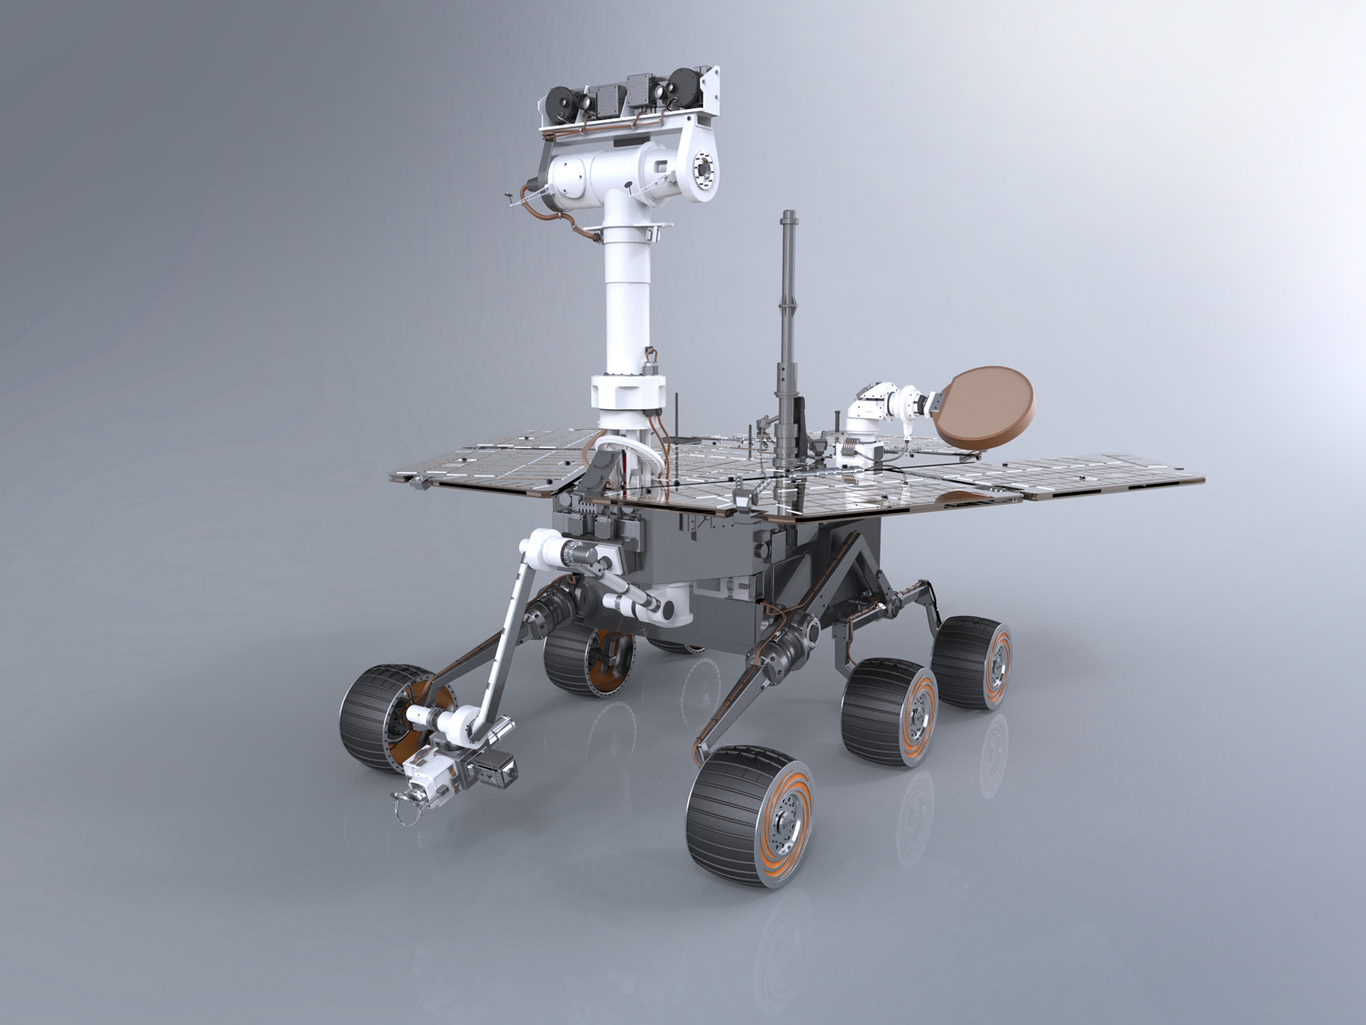 mars rover spirit - HD1366×1025